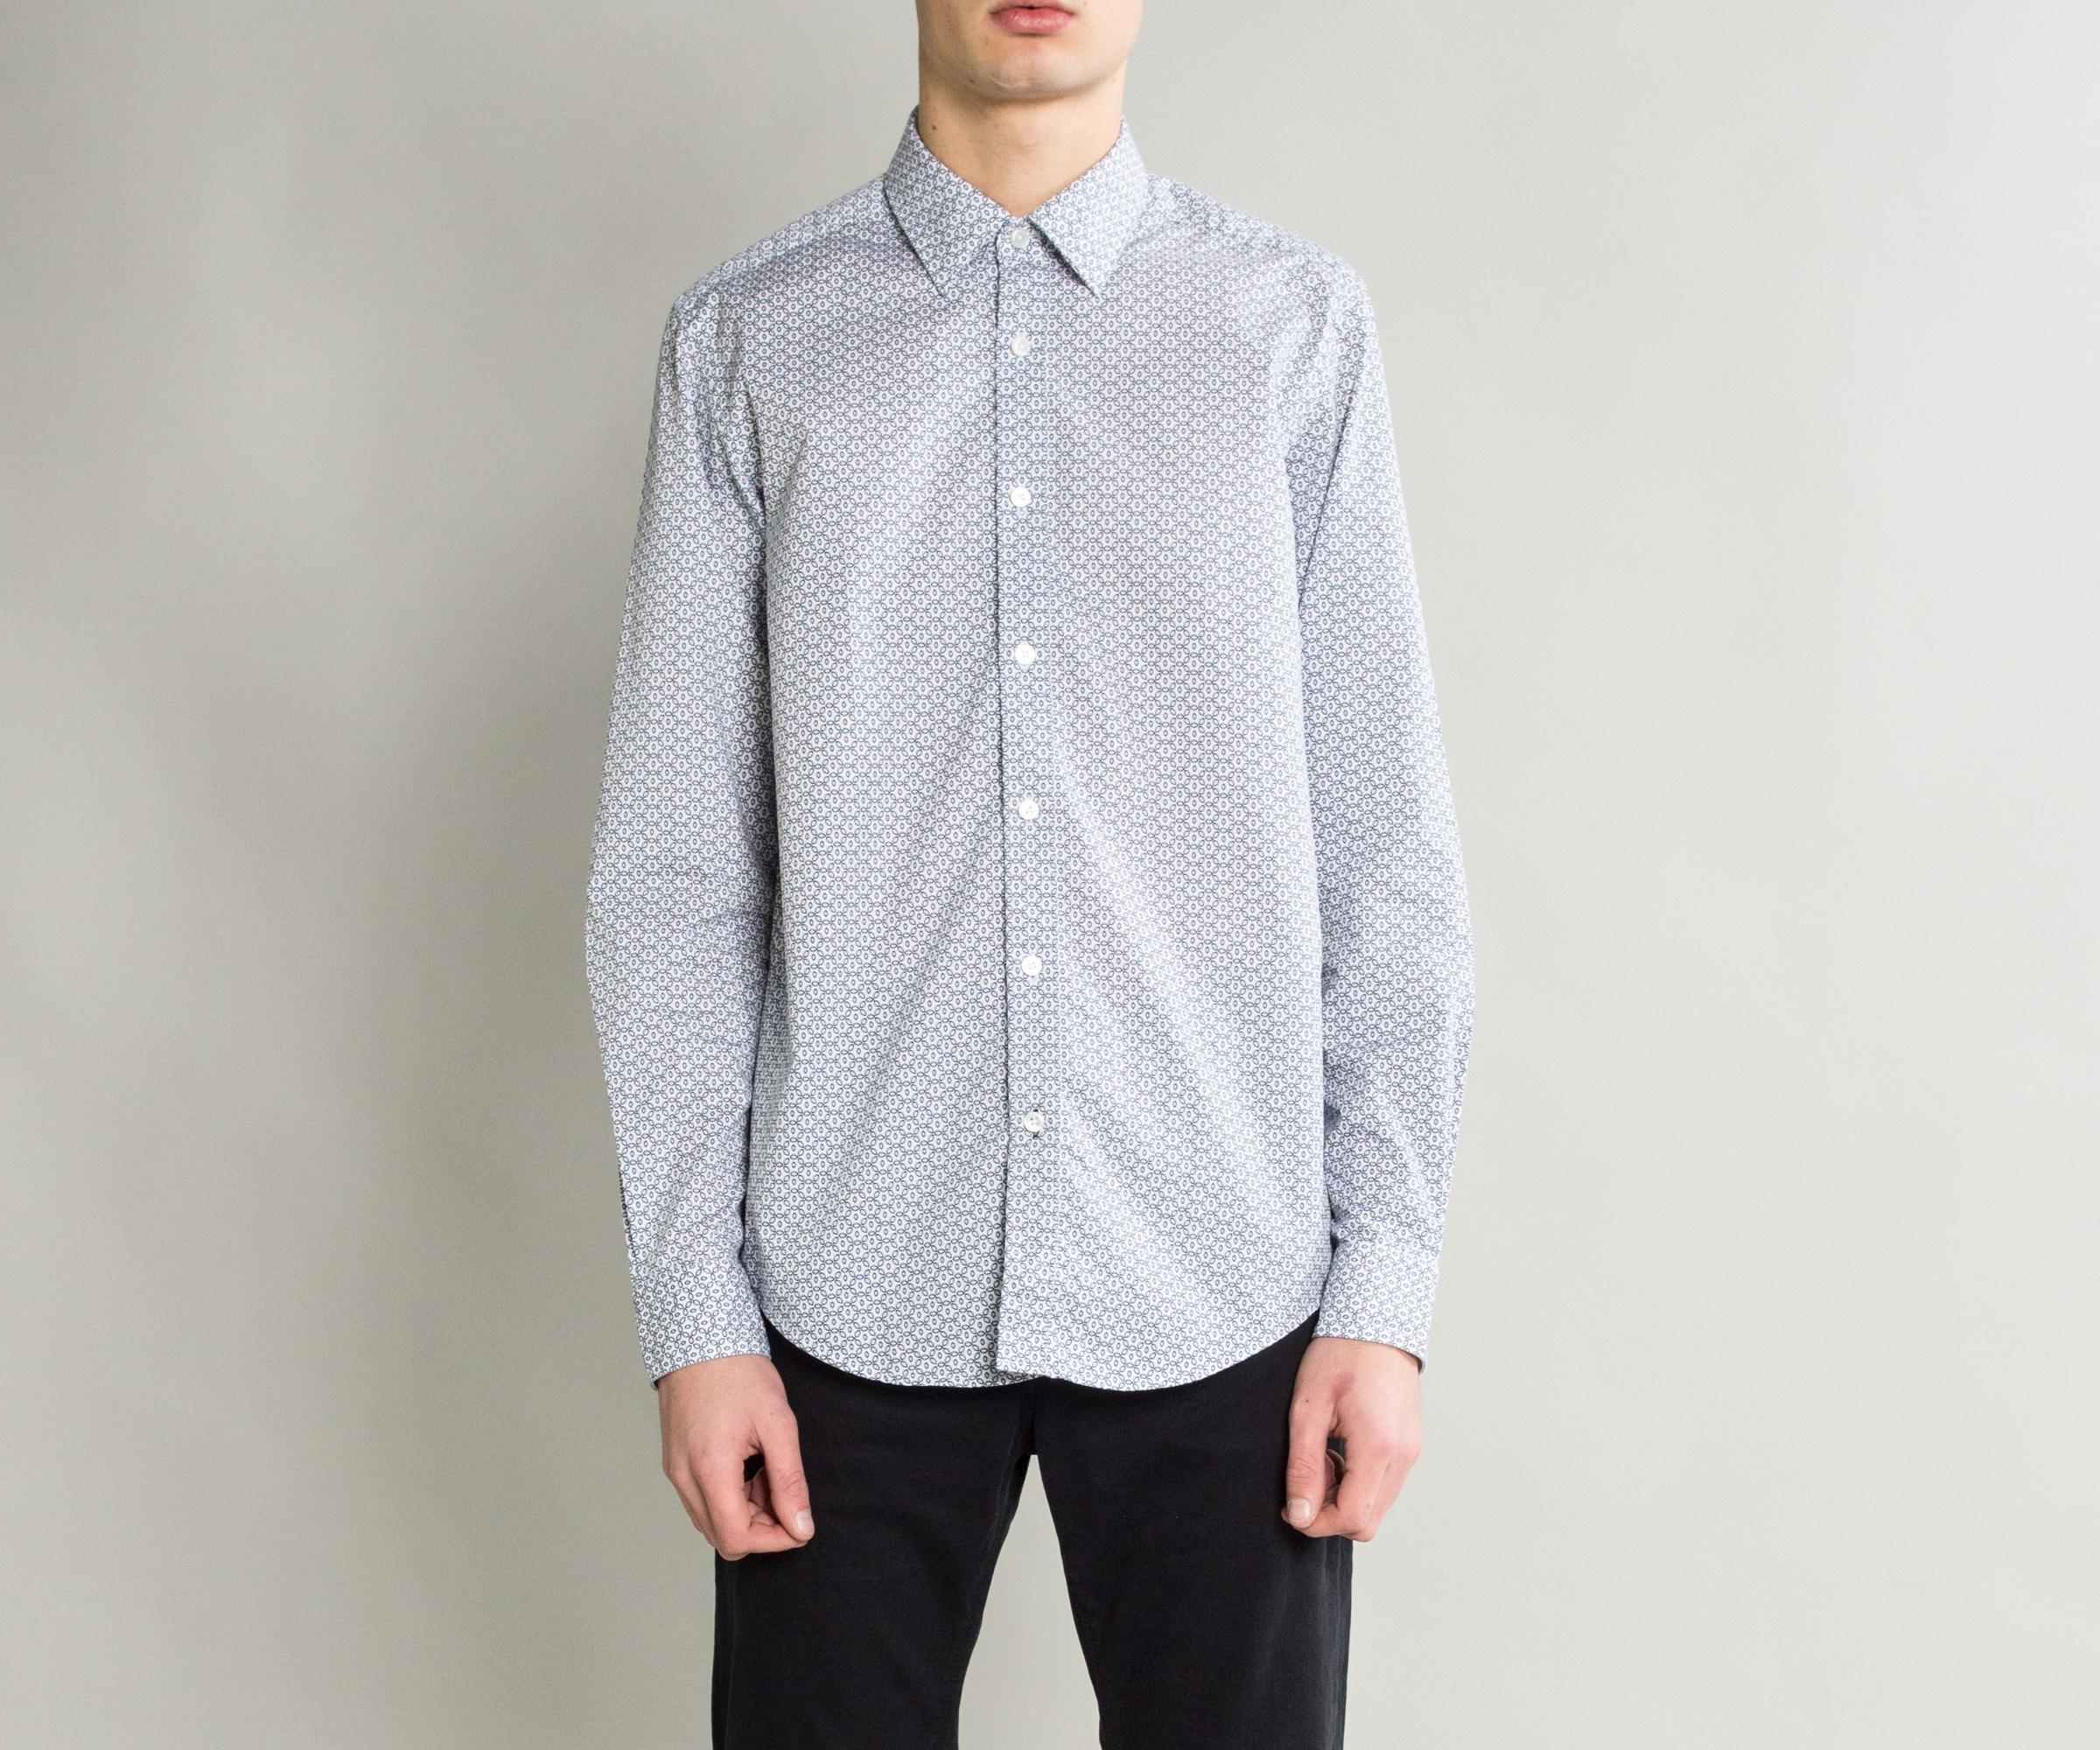 bac26182 BOSS 'lukas-53' Coffee Bean Print Cotton Shirt White in White for ...